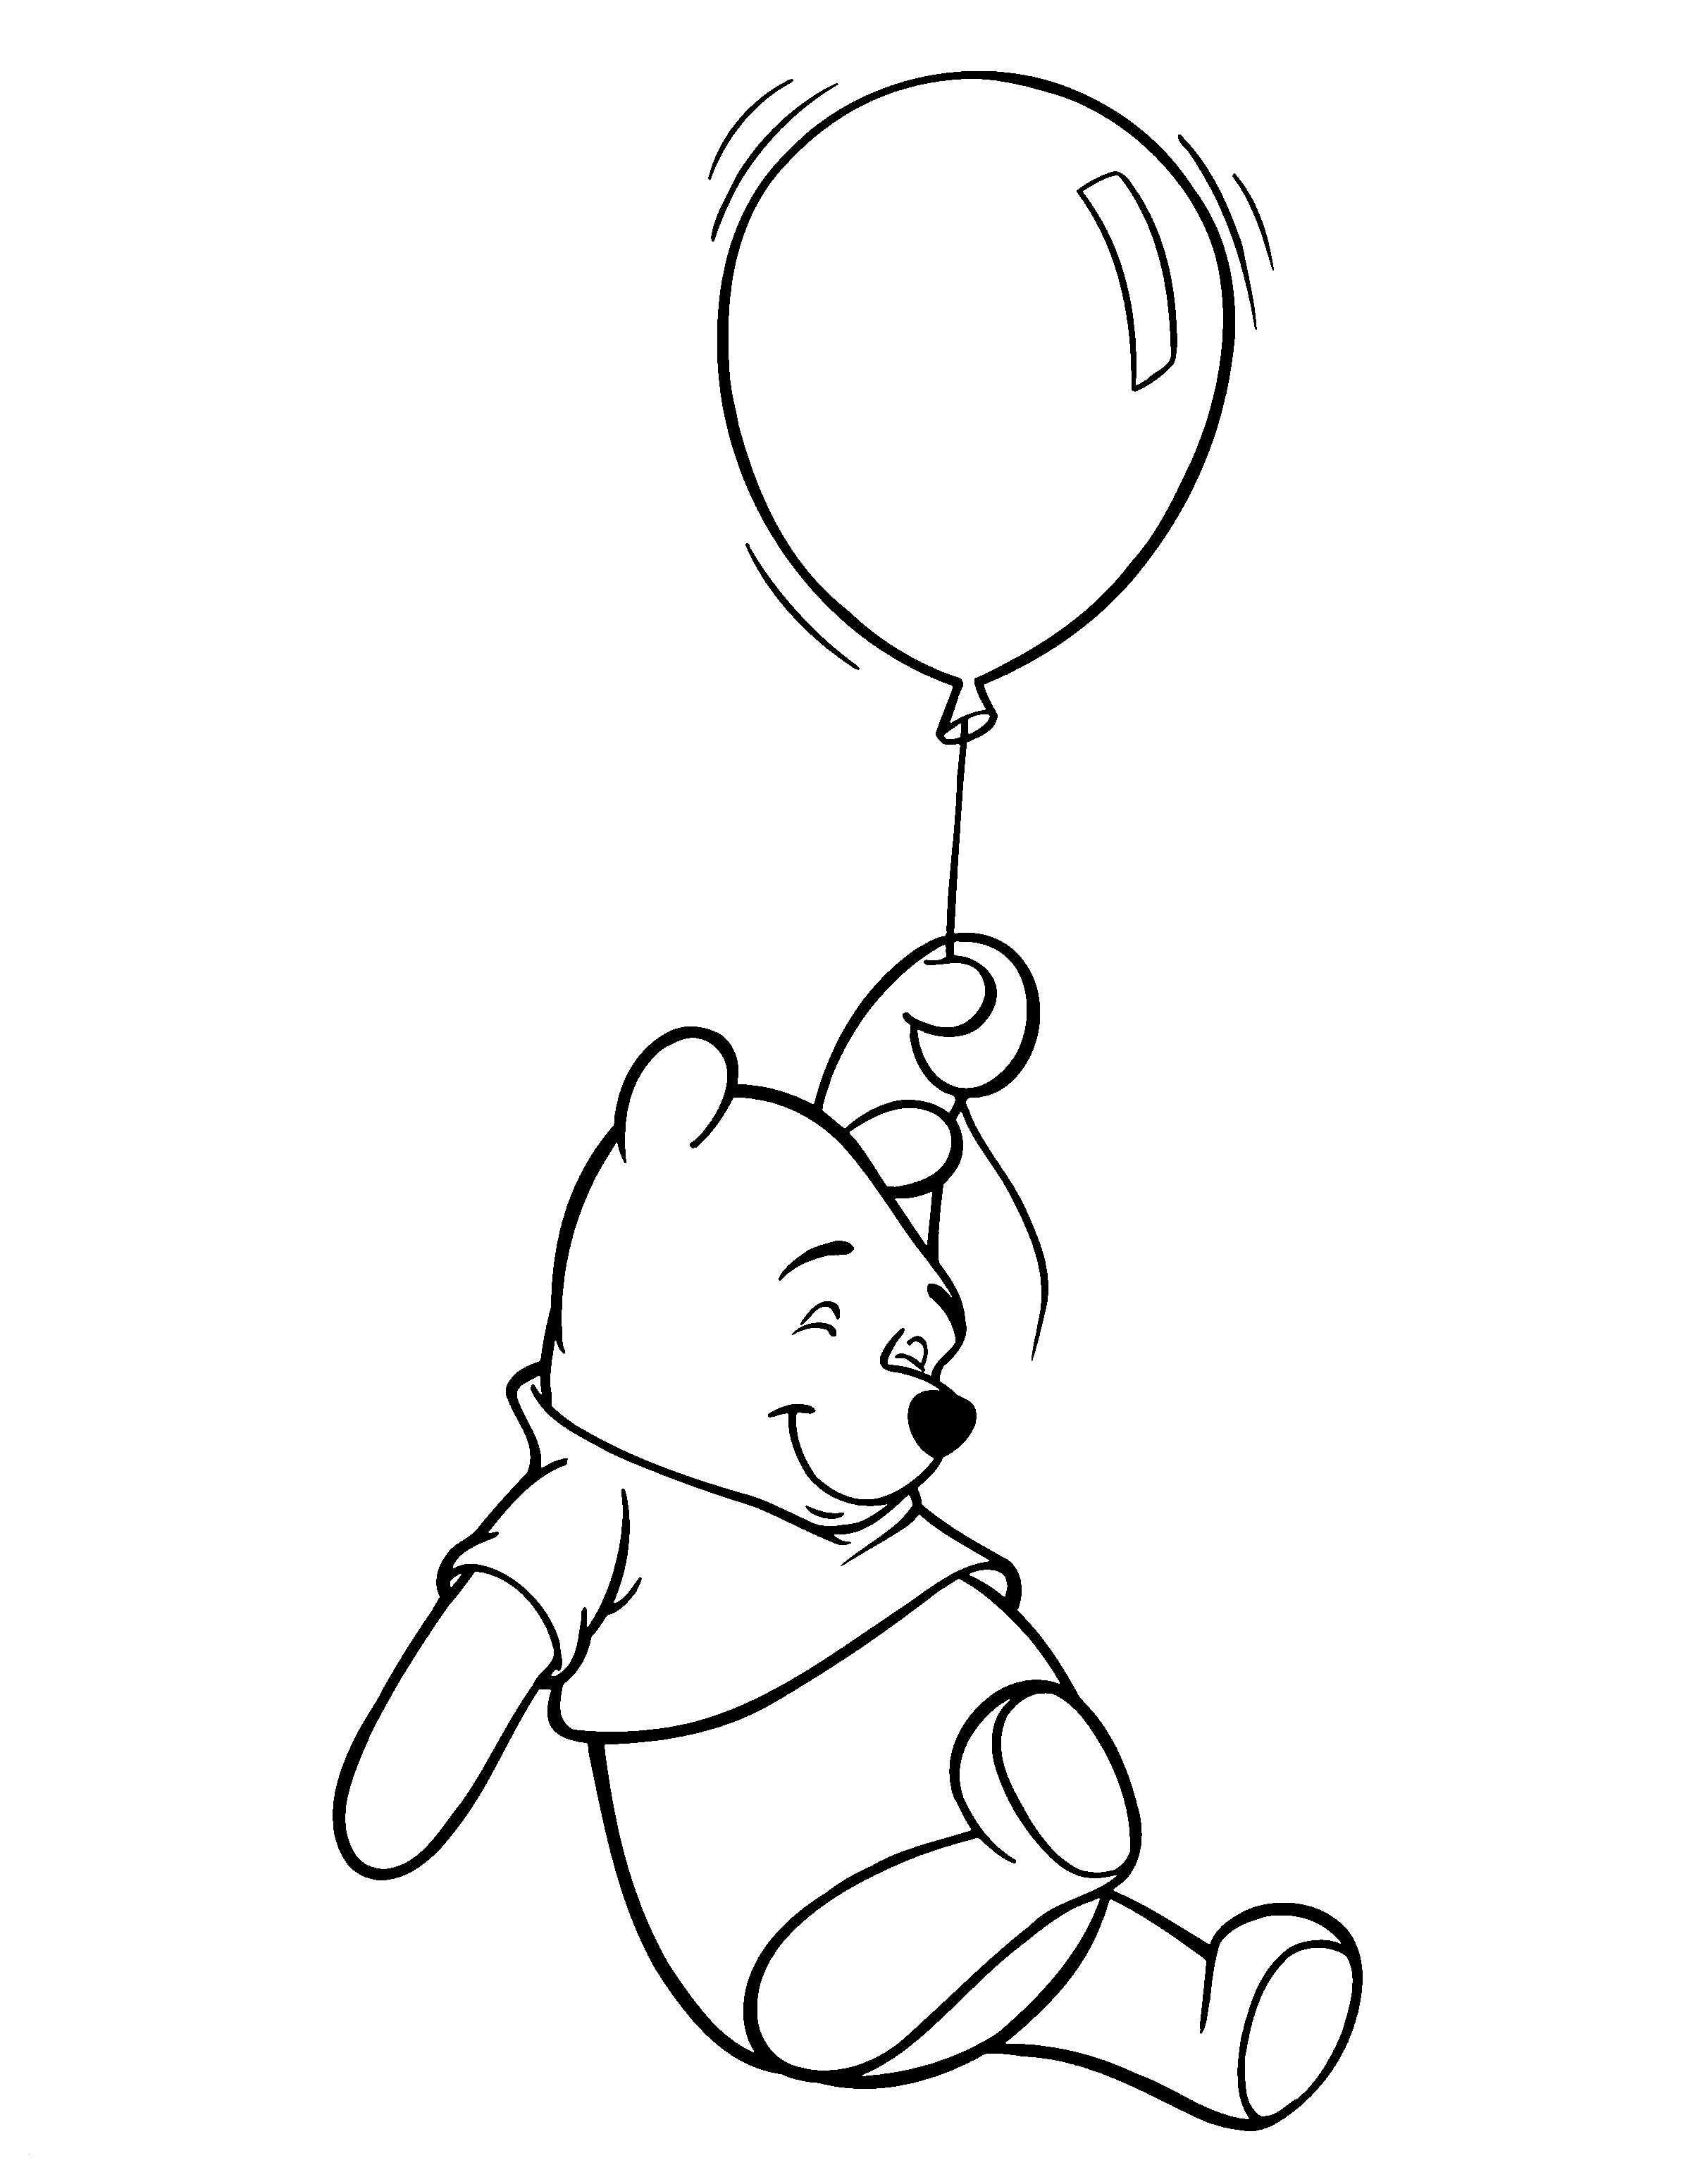 Malvorlagen Winnie Pooh Genial Free Winnie the Pooh Coloring Pages to Print Elegant Ausmalbilder Galerie